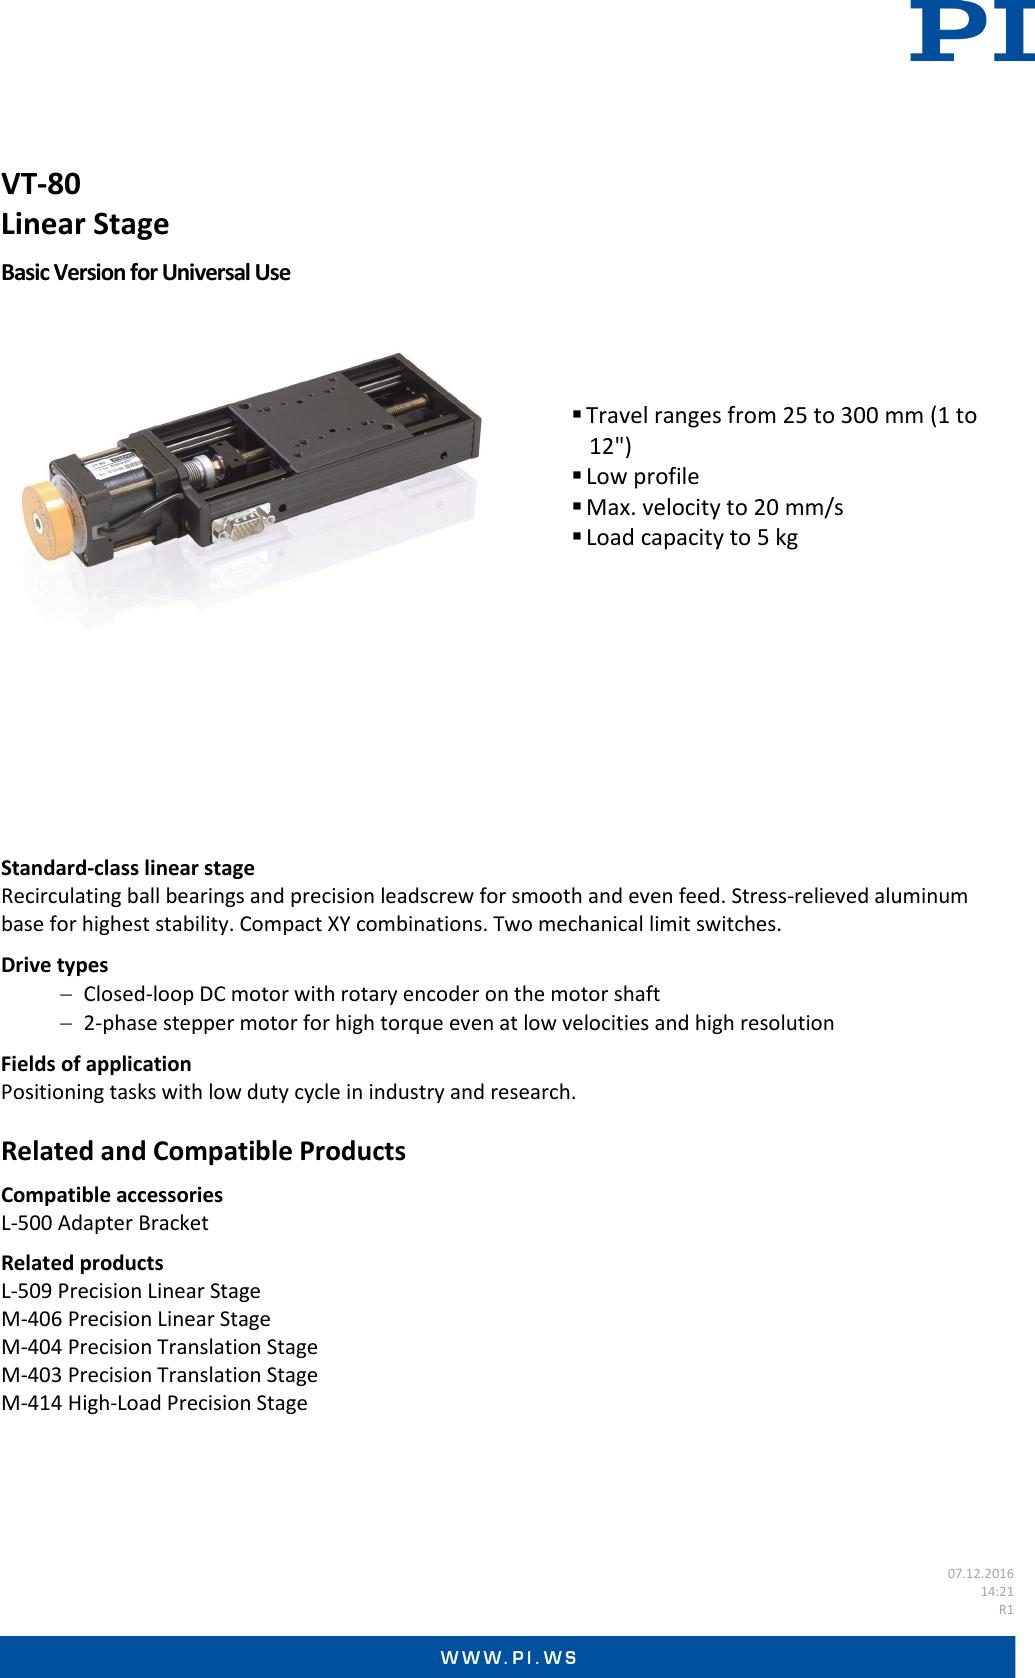 Physik Instrumente Datasheet VT 80